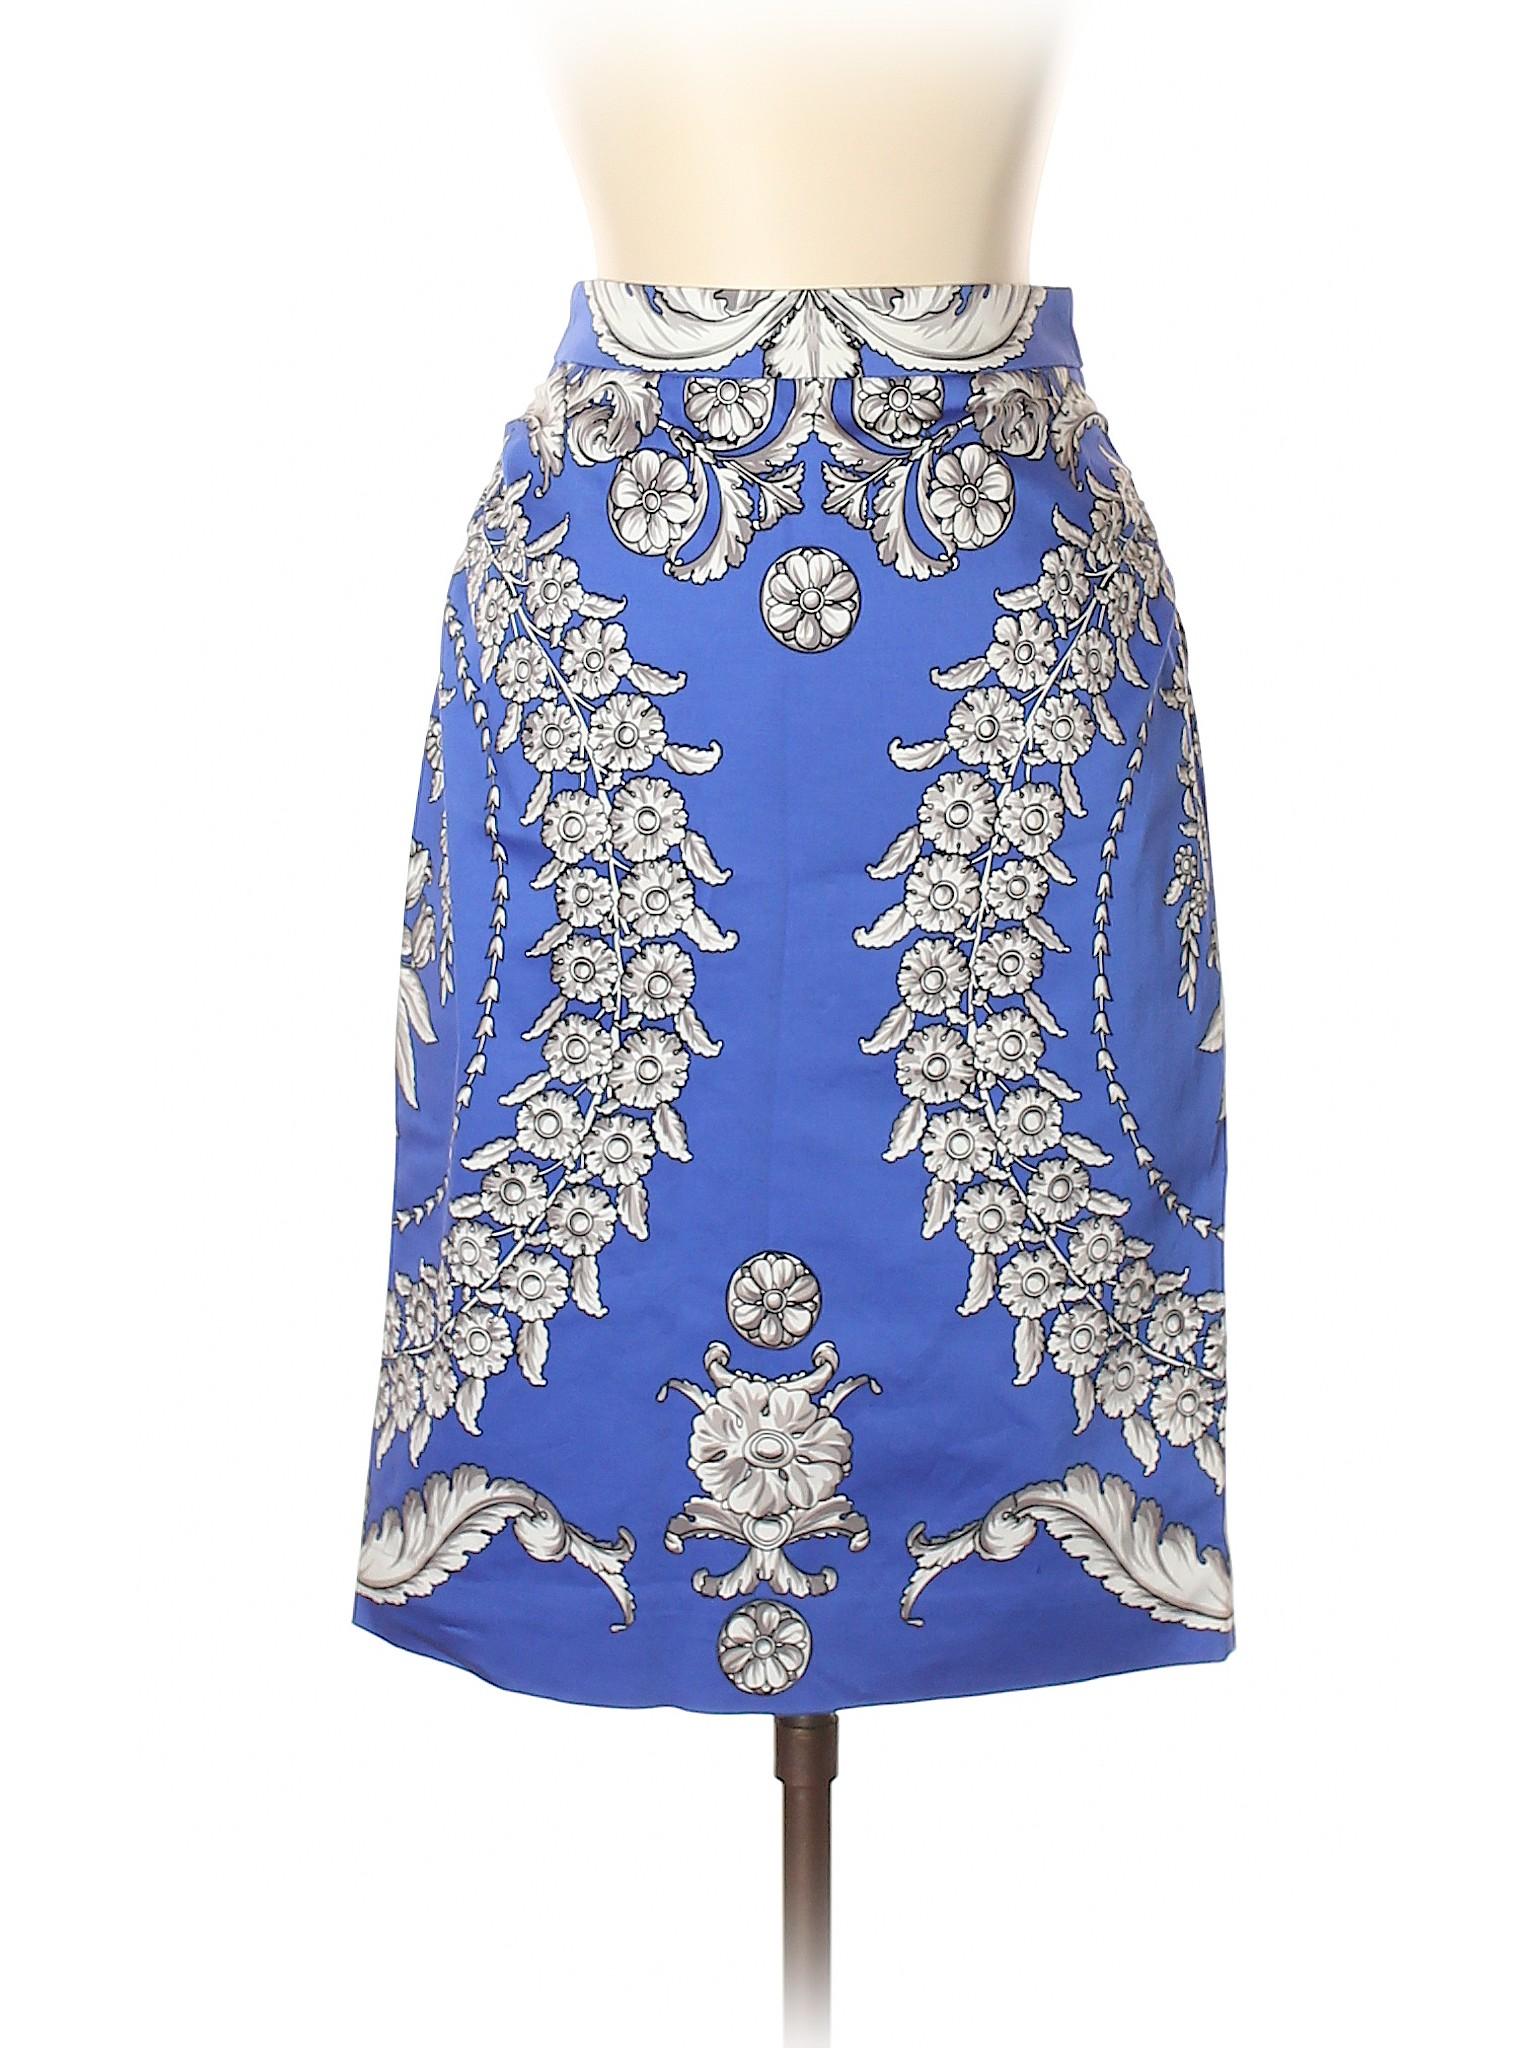 Boutique Casual Boutique Skirt Boutique Skirt Boutique Casual Casual Casual Skirt ZddAr6